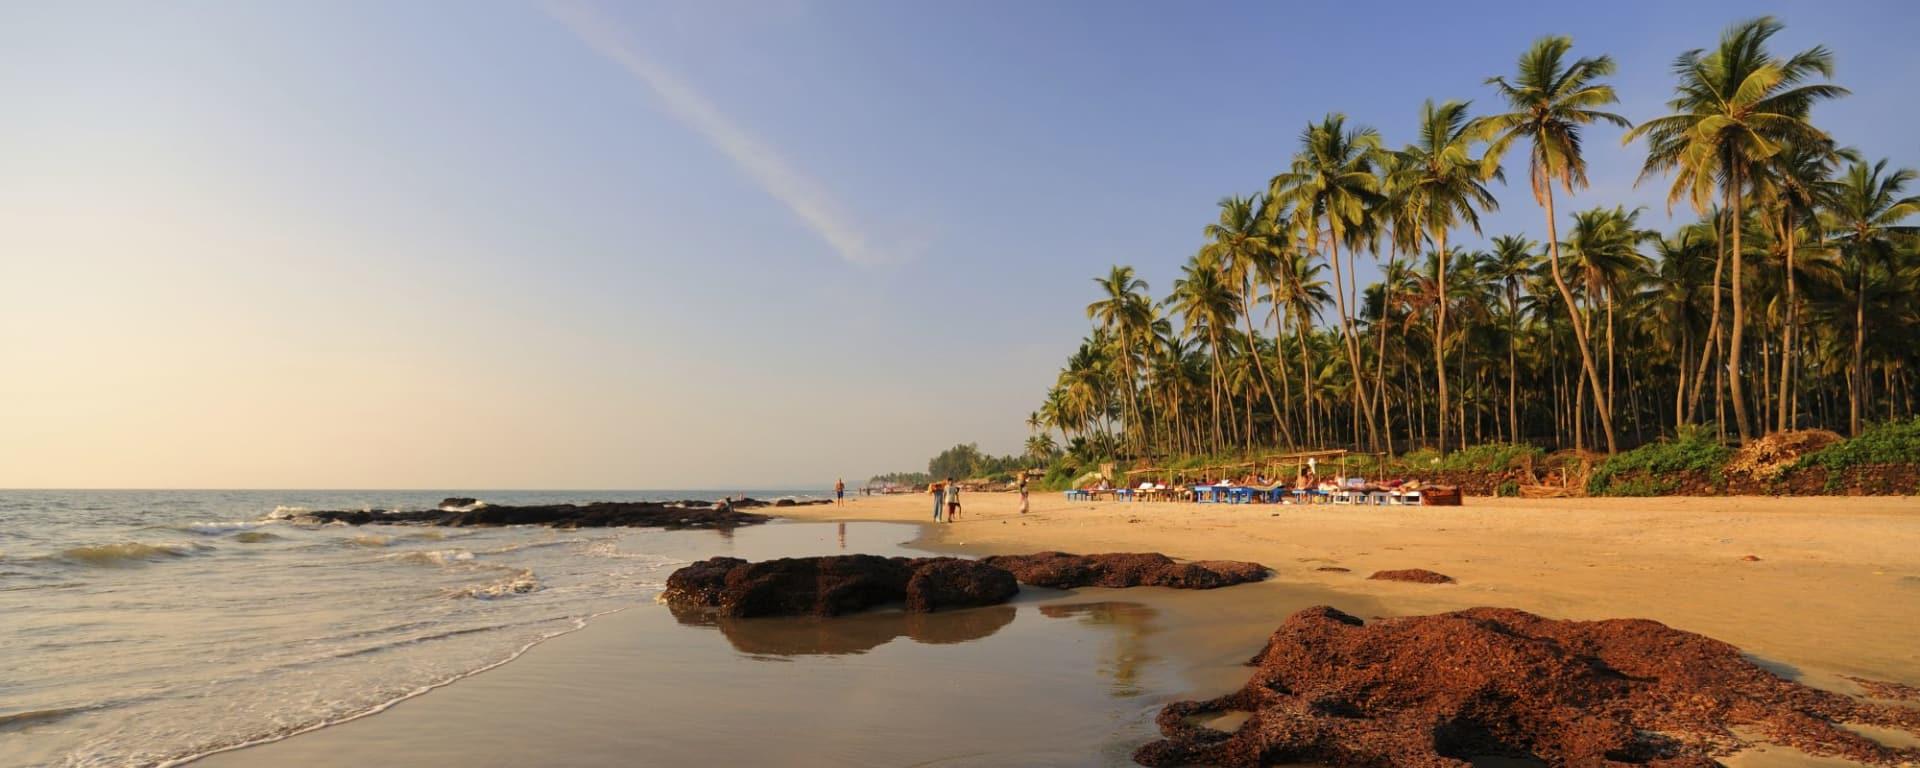 Goa dans toute sa diversité: Morjim Beach in Goa